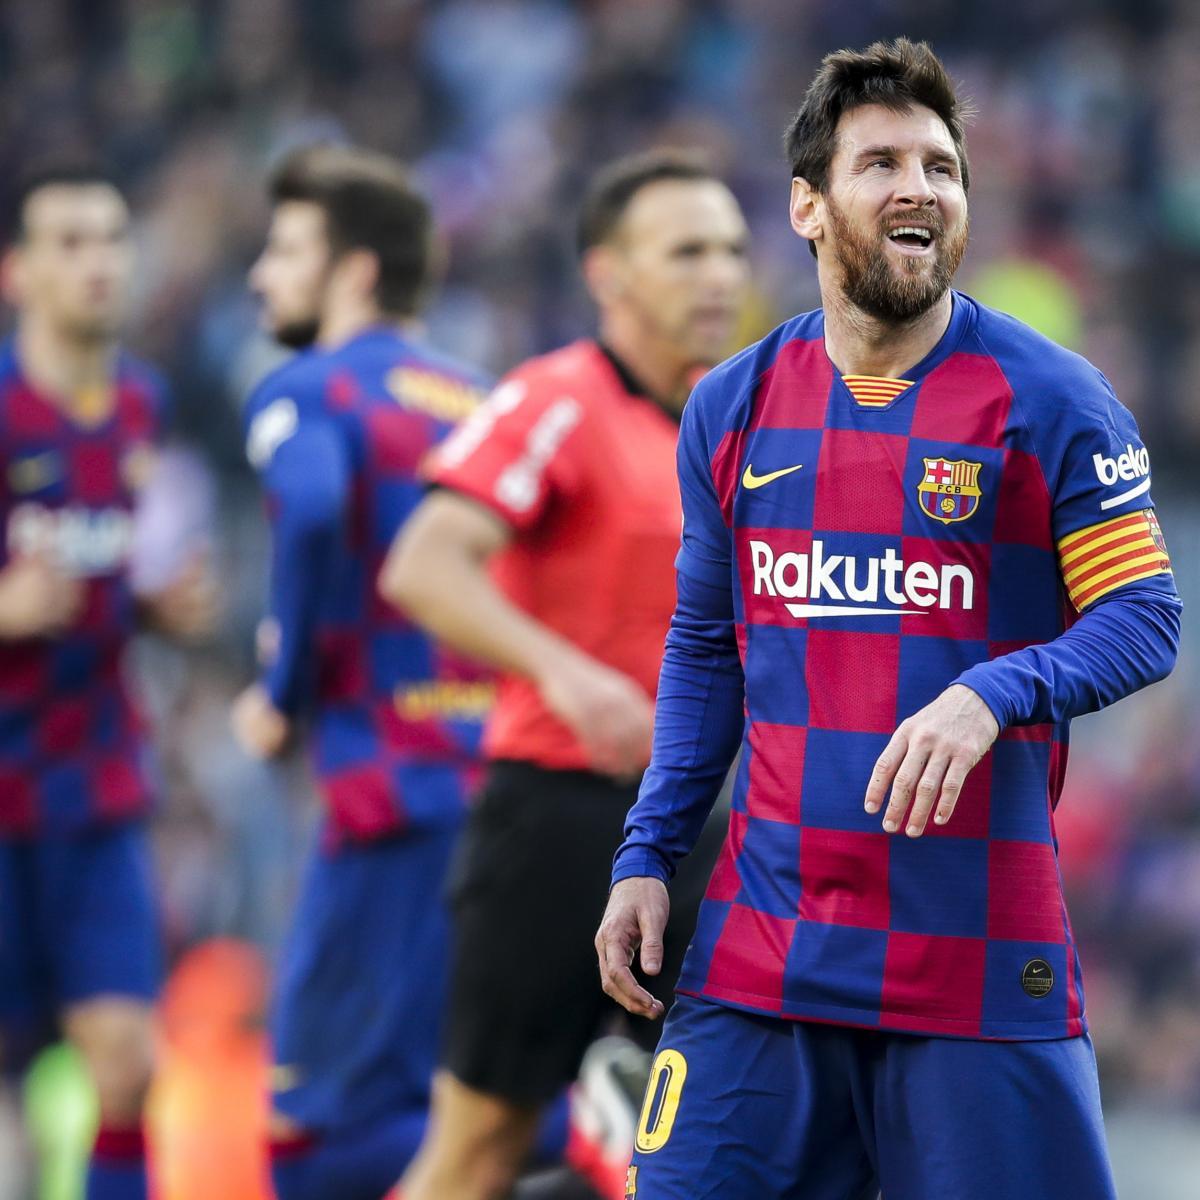 'B-----d' Lionel Messi Rests During Games, Says Jose Luis Mendilibar